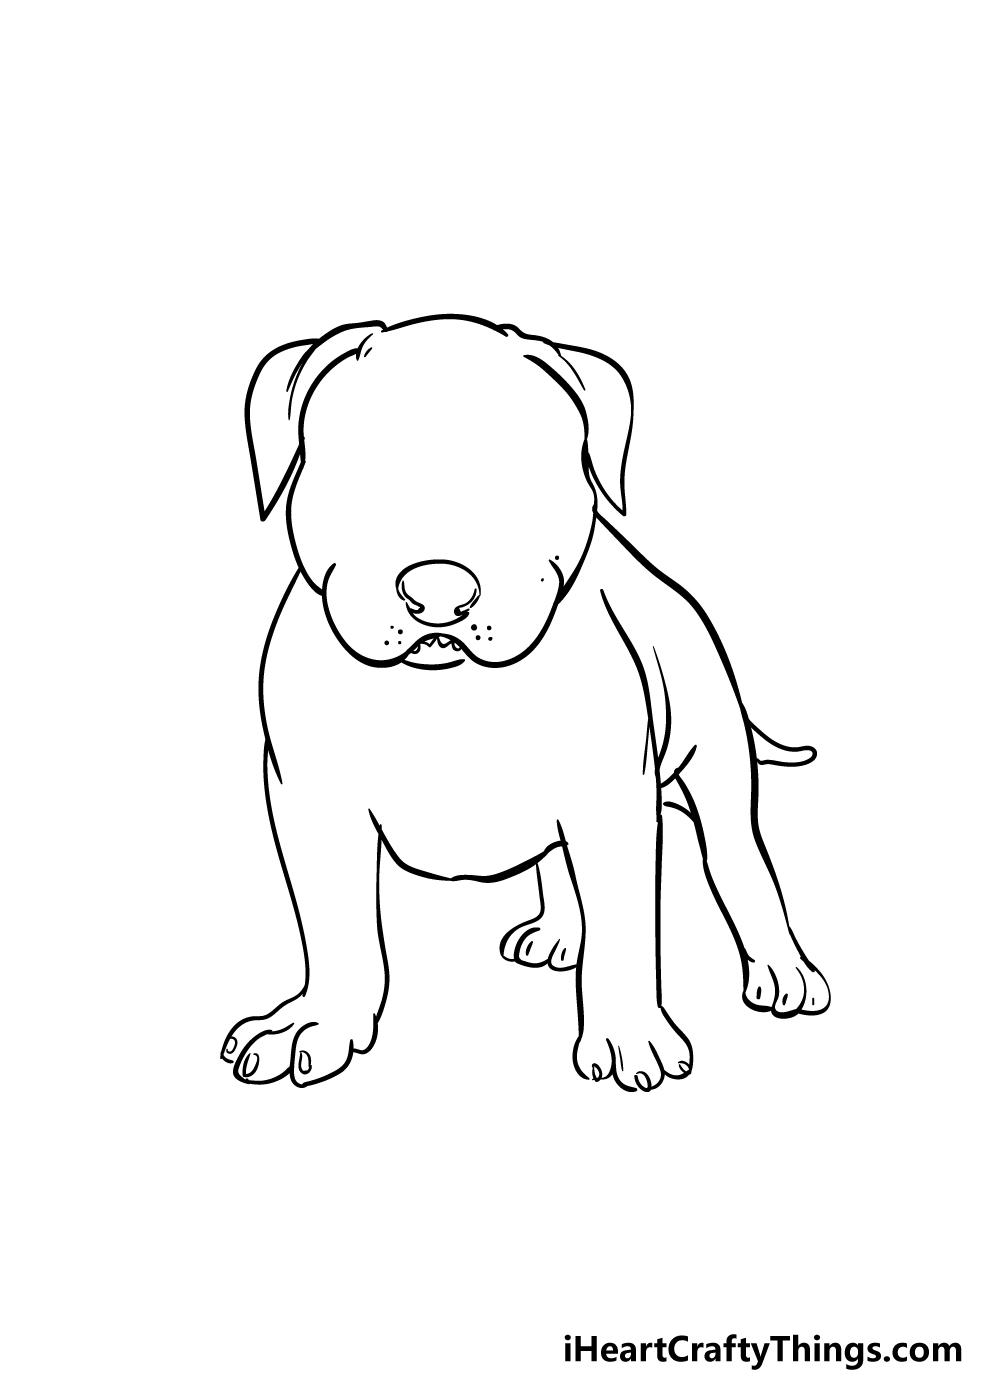 pitbull drawing step 6